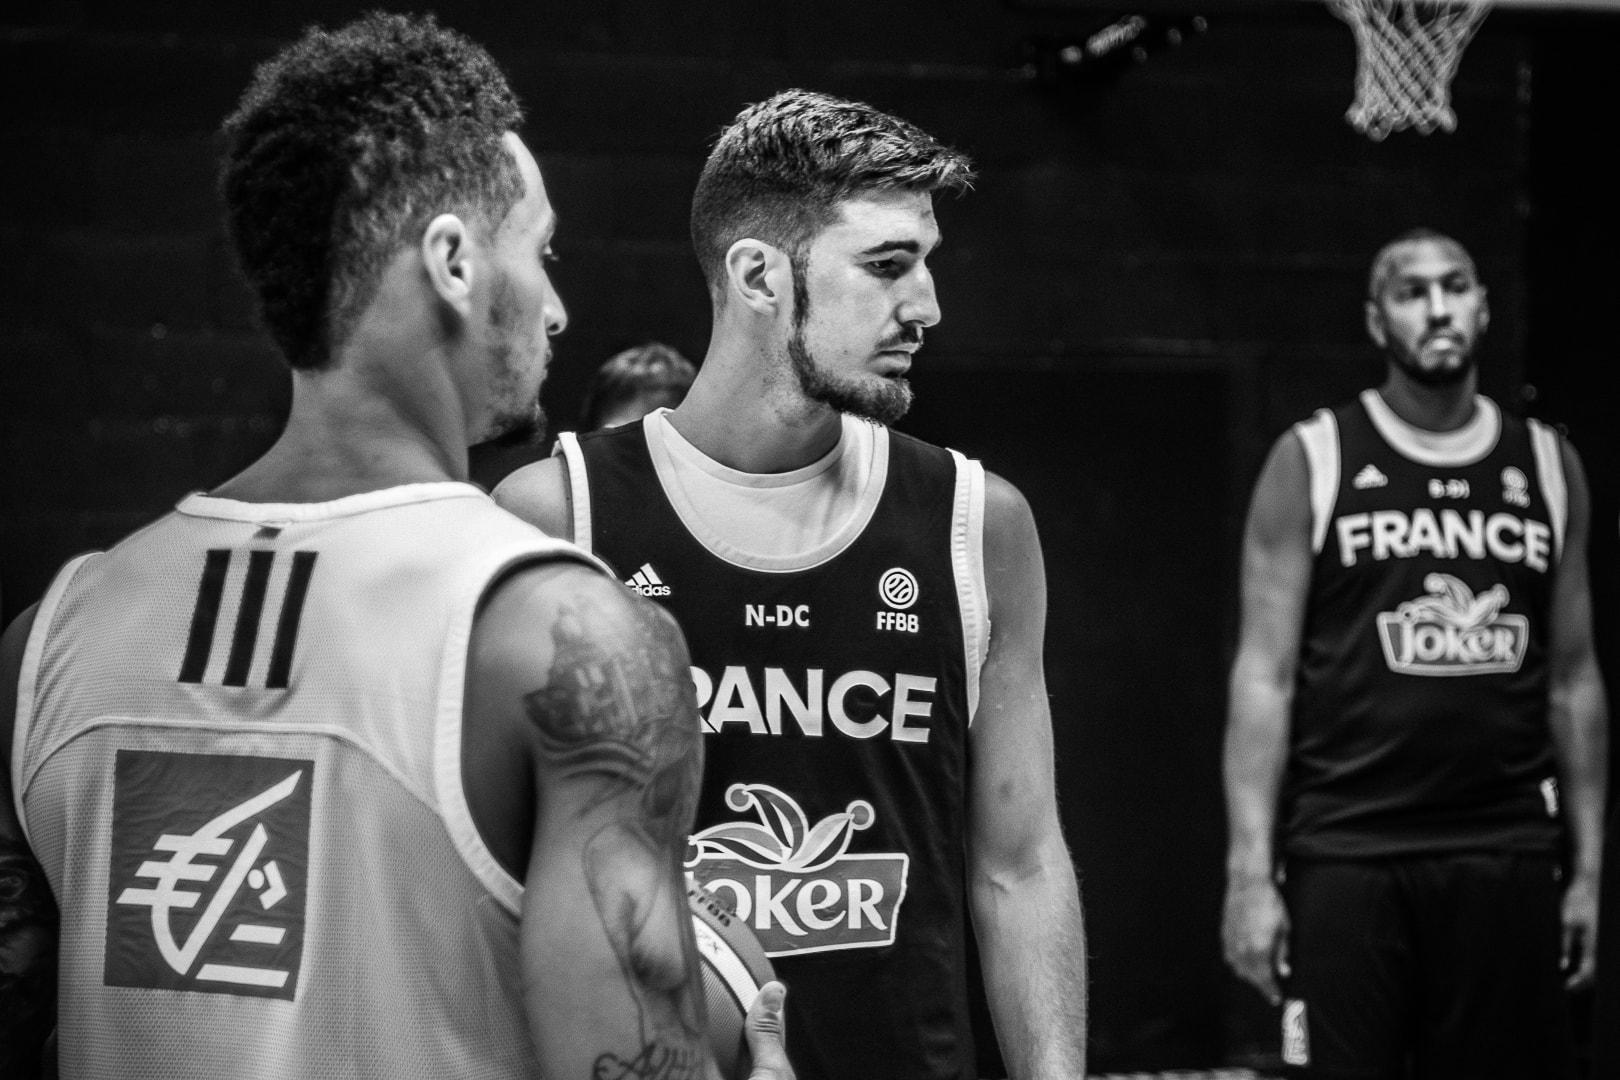 trezors-photography-photographe-professionnel-toulouse-31-sport-lifestyle-edf-basketball (2)